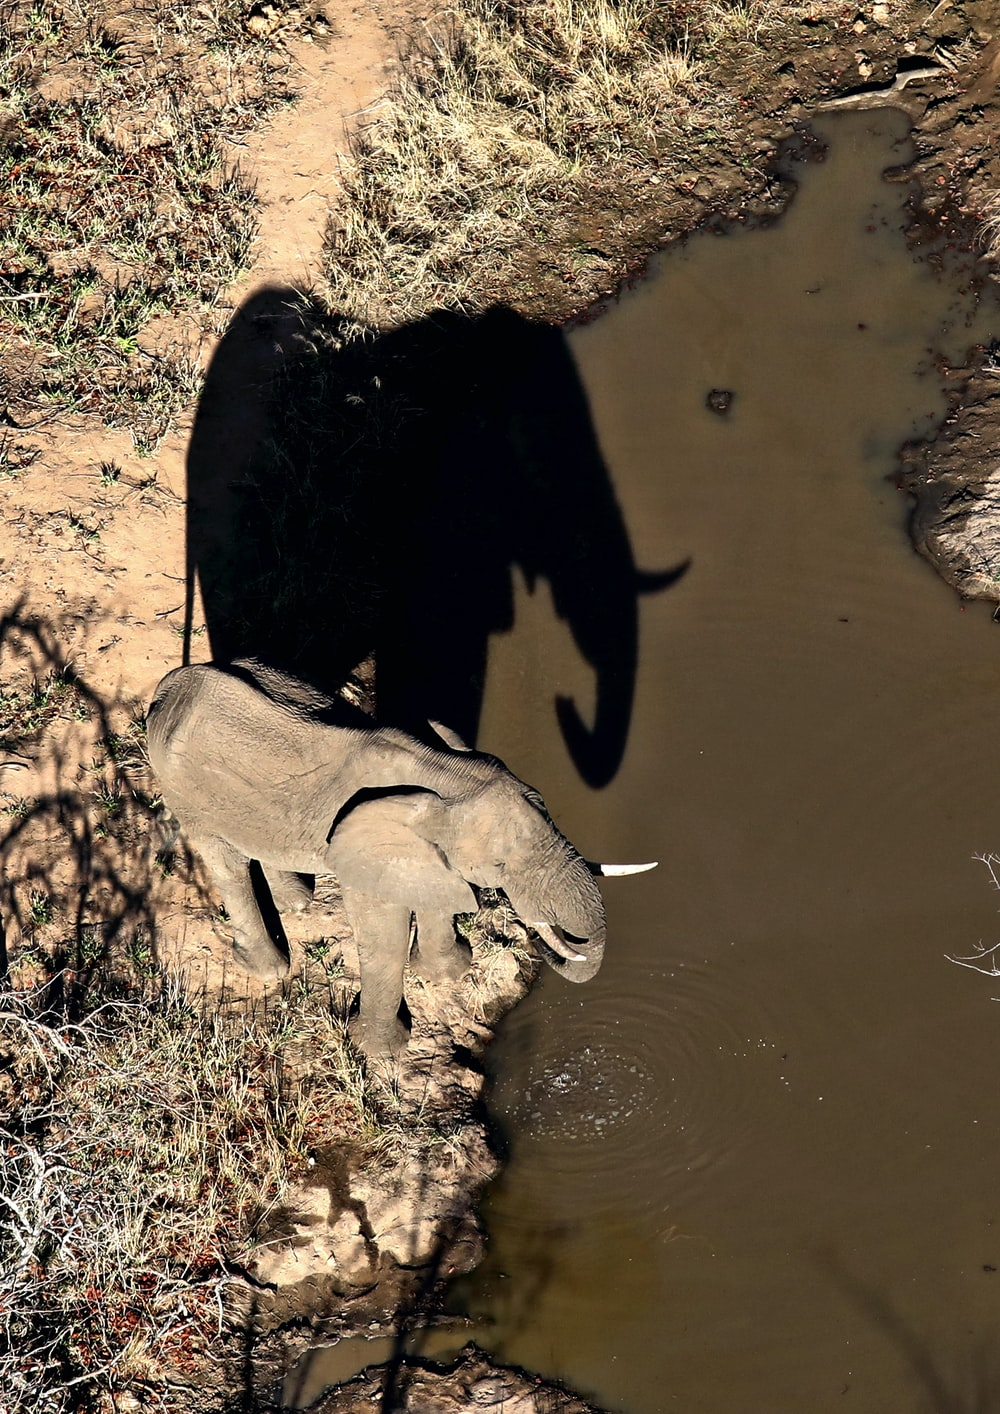 brown elephant near body of water